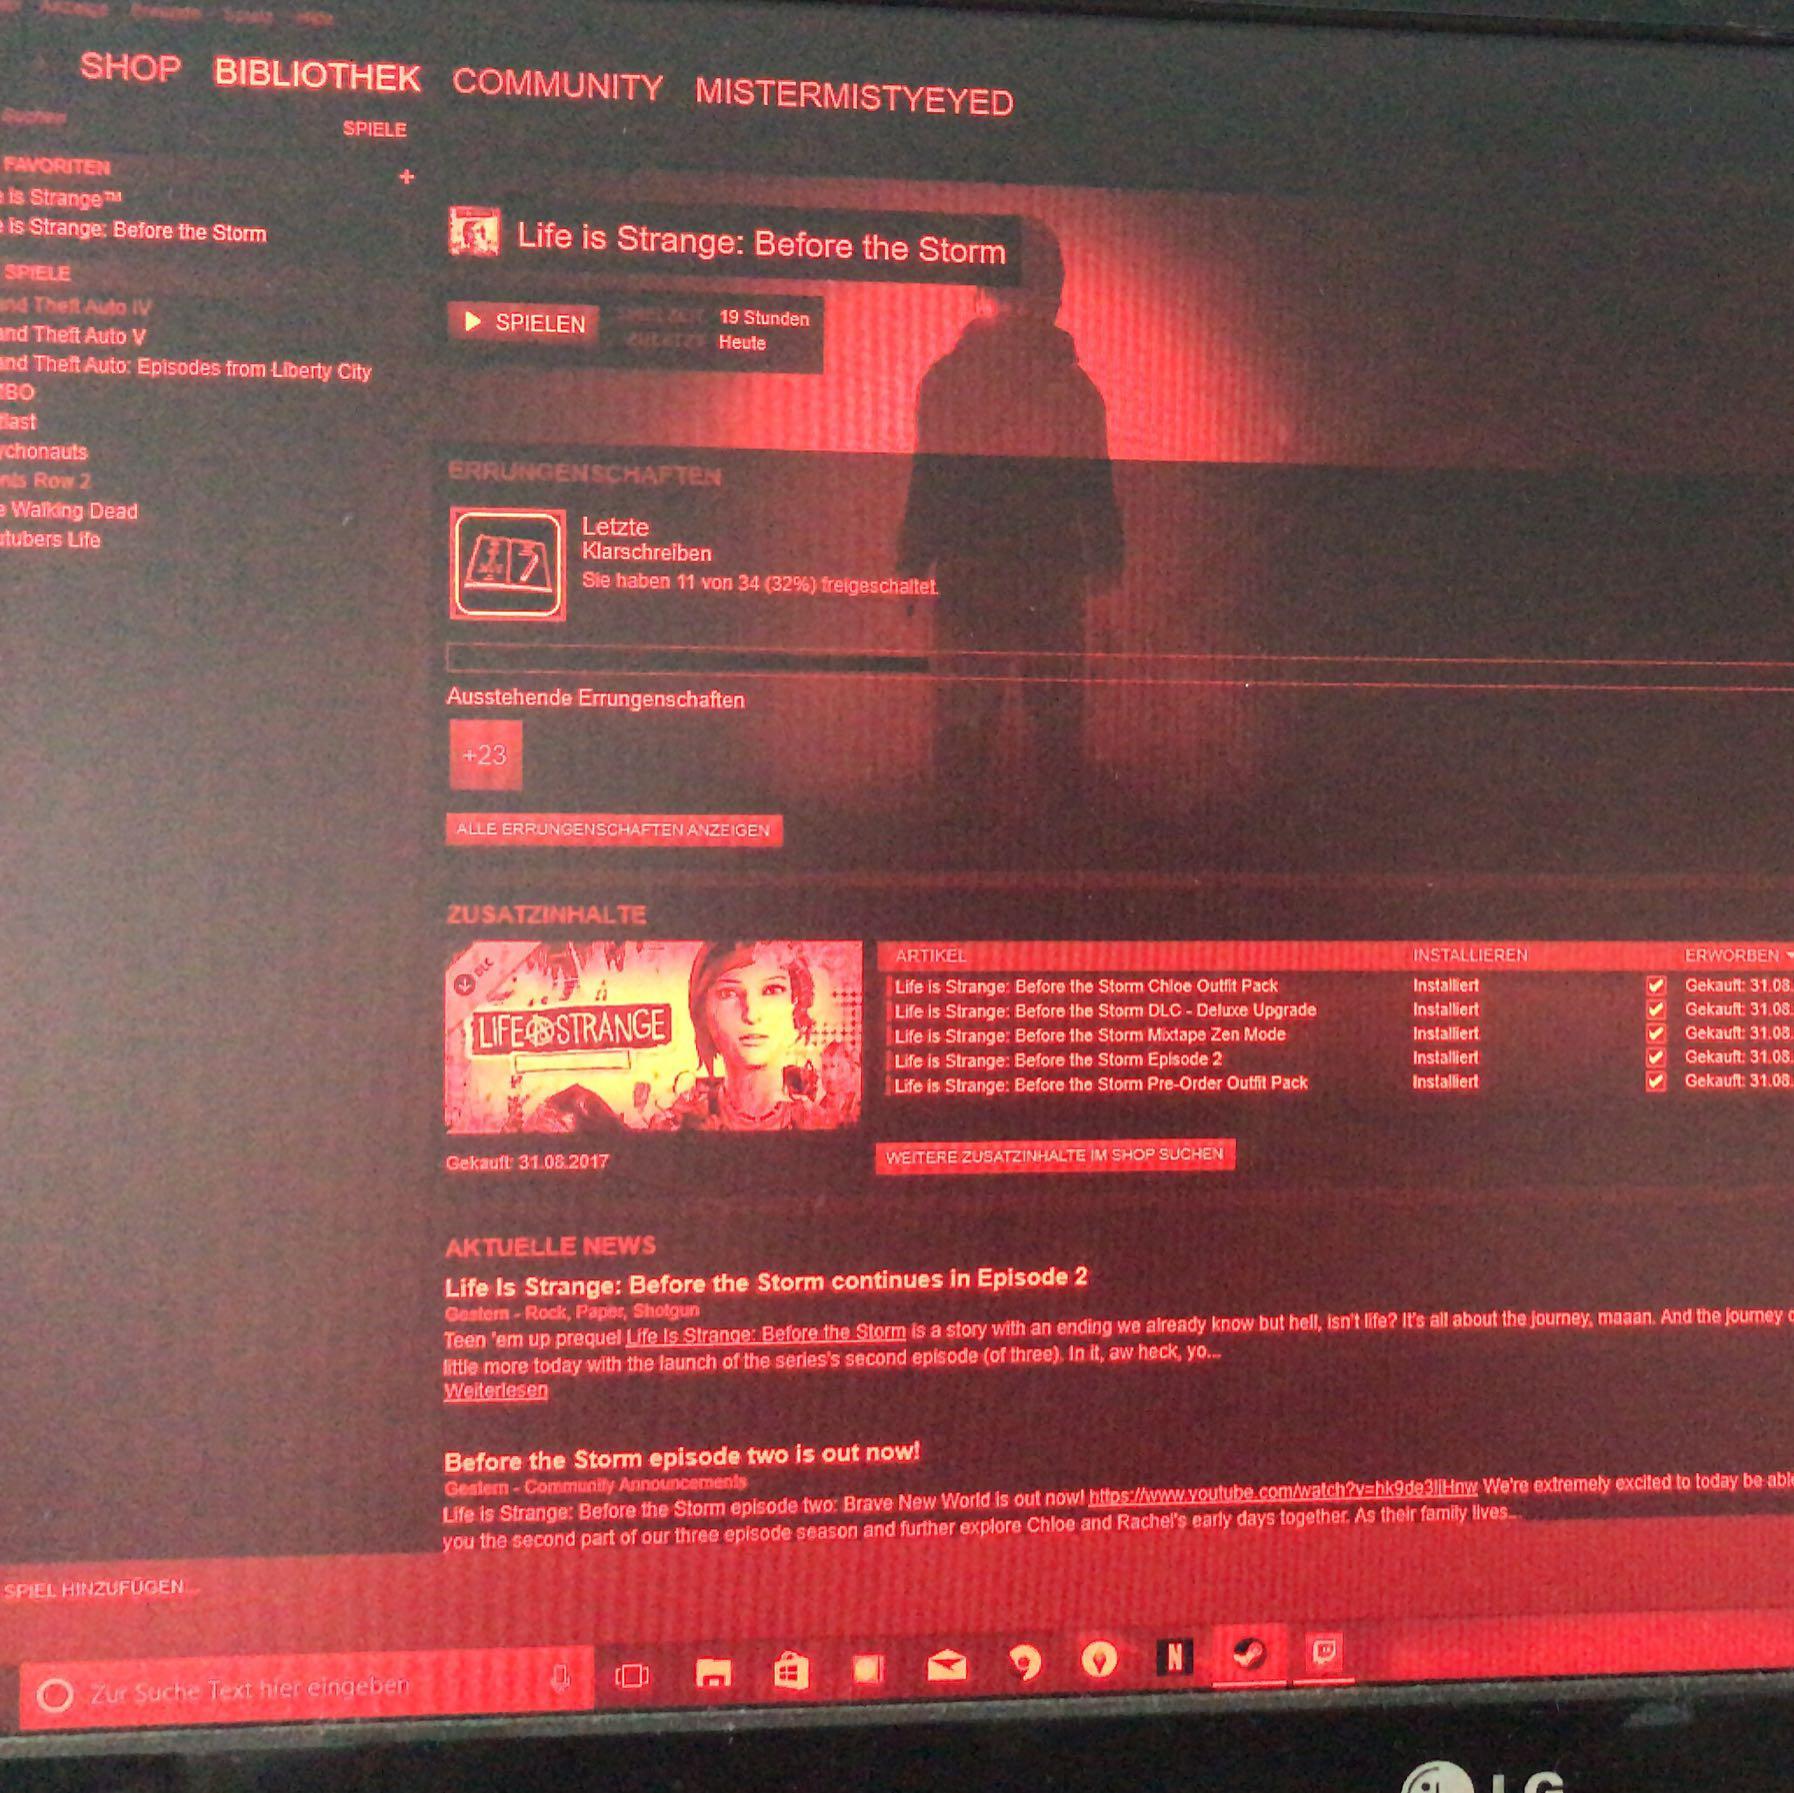 Monitor Ist Plotzlich Rot Lila Computer Pc Technik